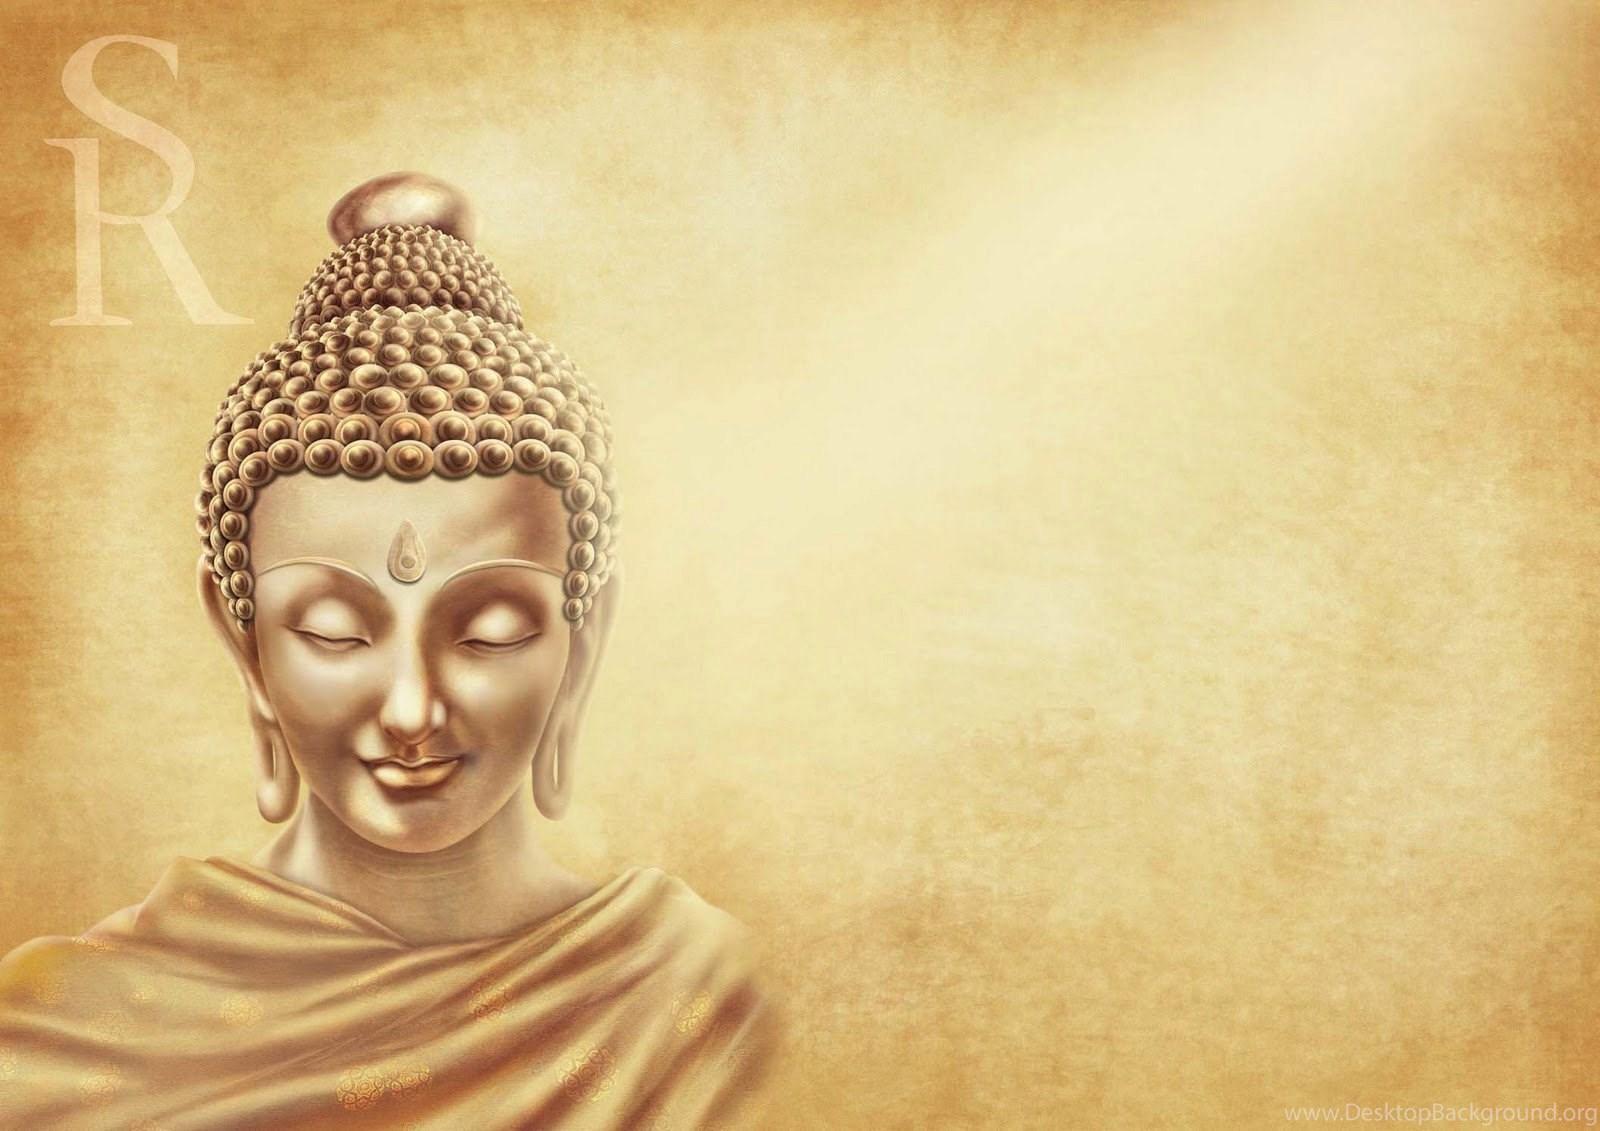 Buddha Images Hd Wallpaper Buddha Quotes Wallpaper Hd 13909 Baltana